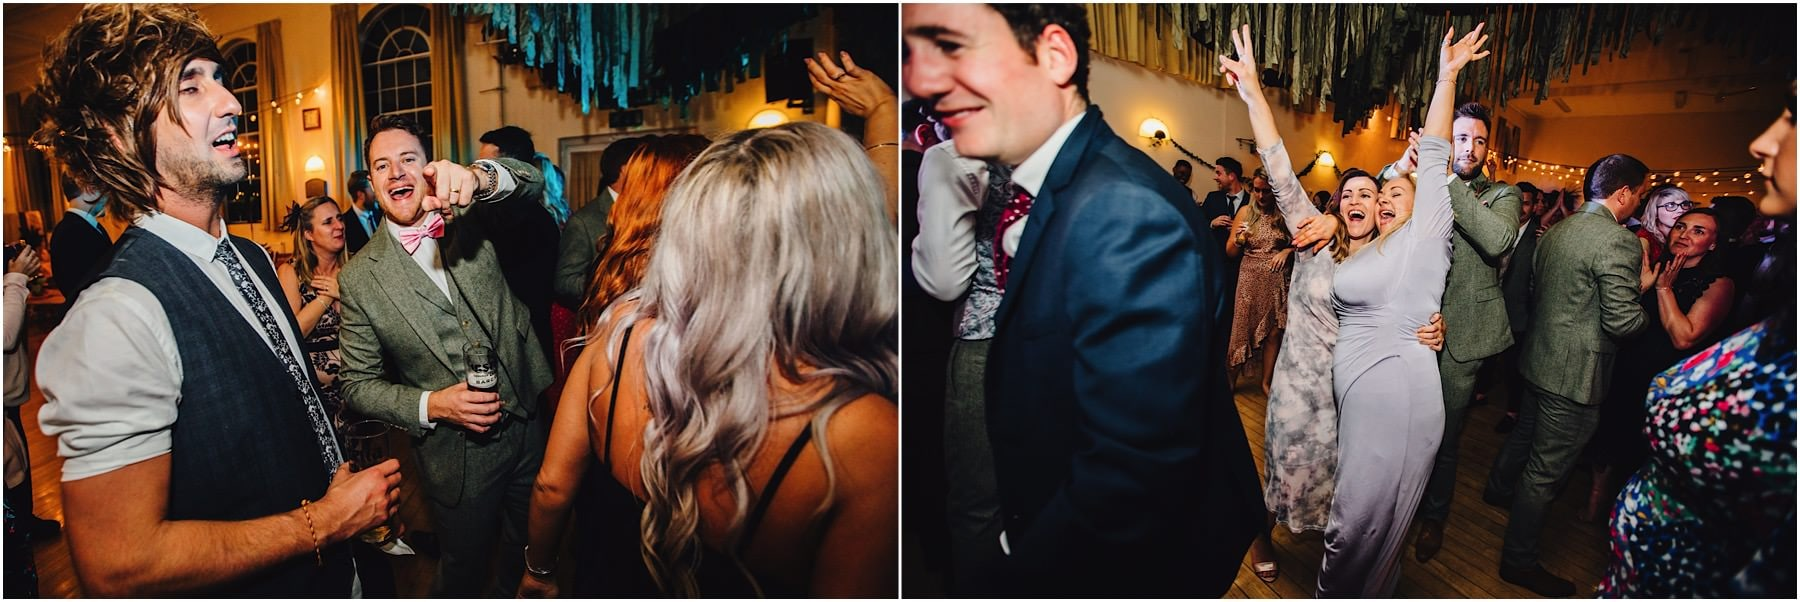 wedding guests dancing and enjoying evening reception